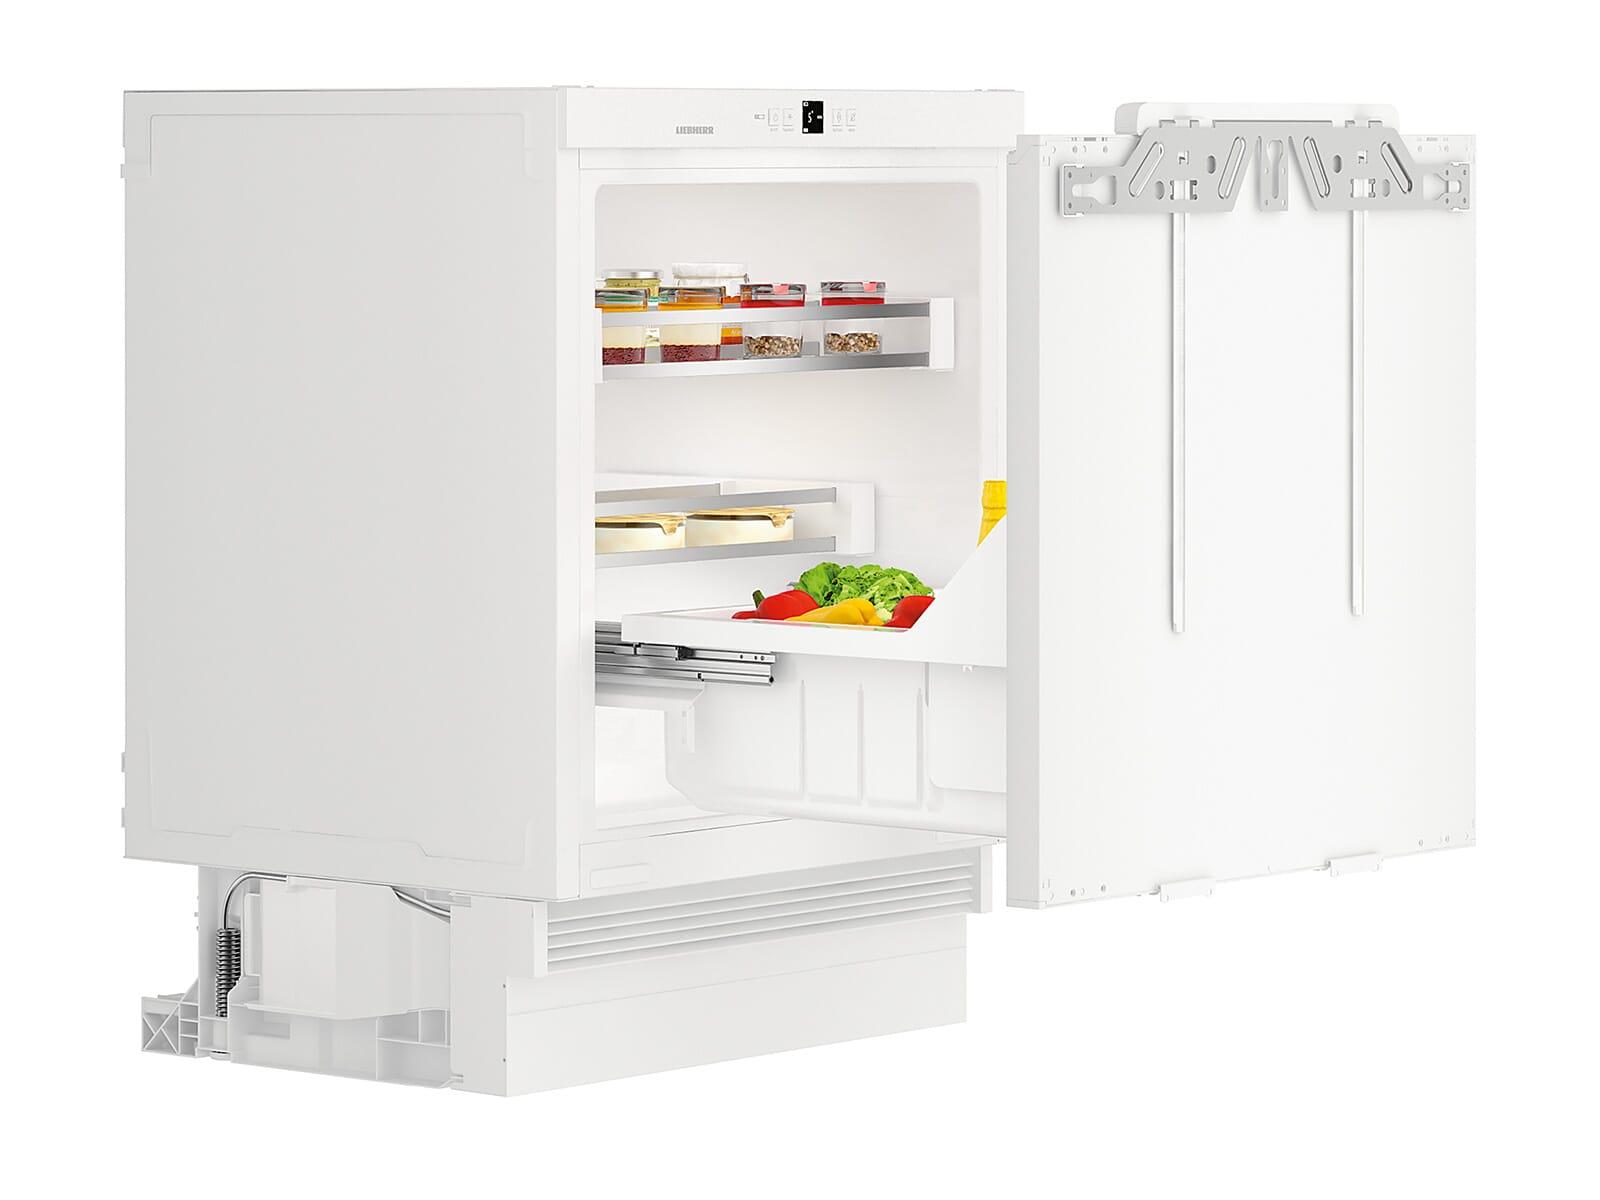 Aeg Kühlschrank Santo 2330 I : Kühlschrank a siemens ki31rvf30 iq300 einbau kühlschrank a 102 1